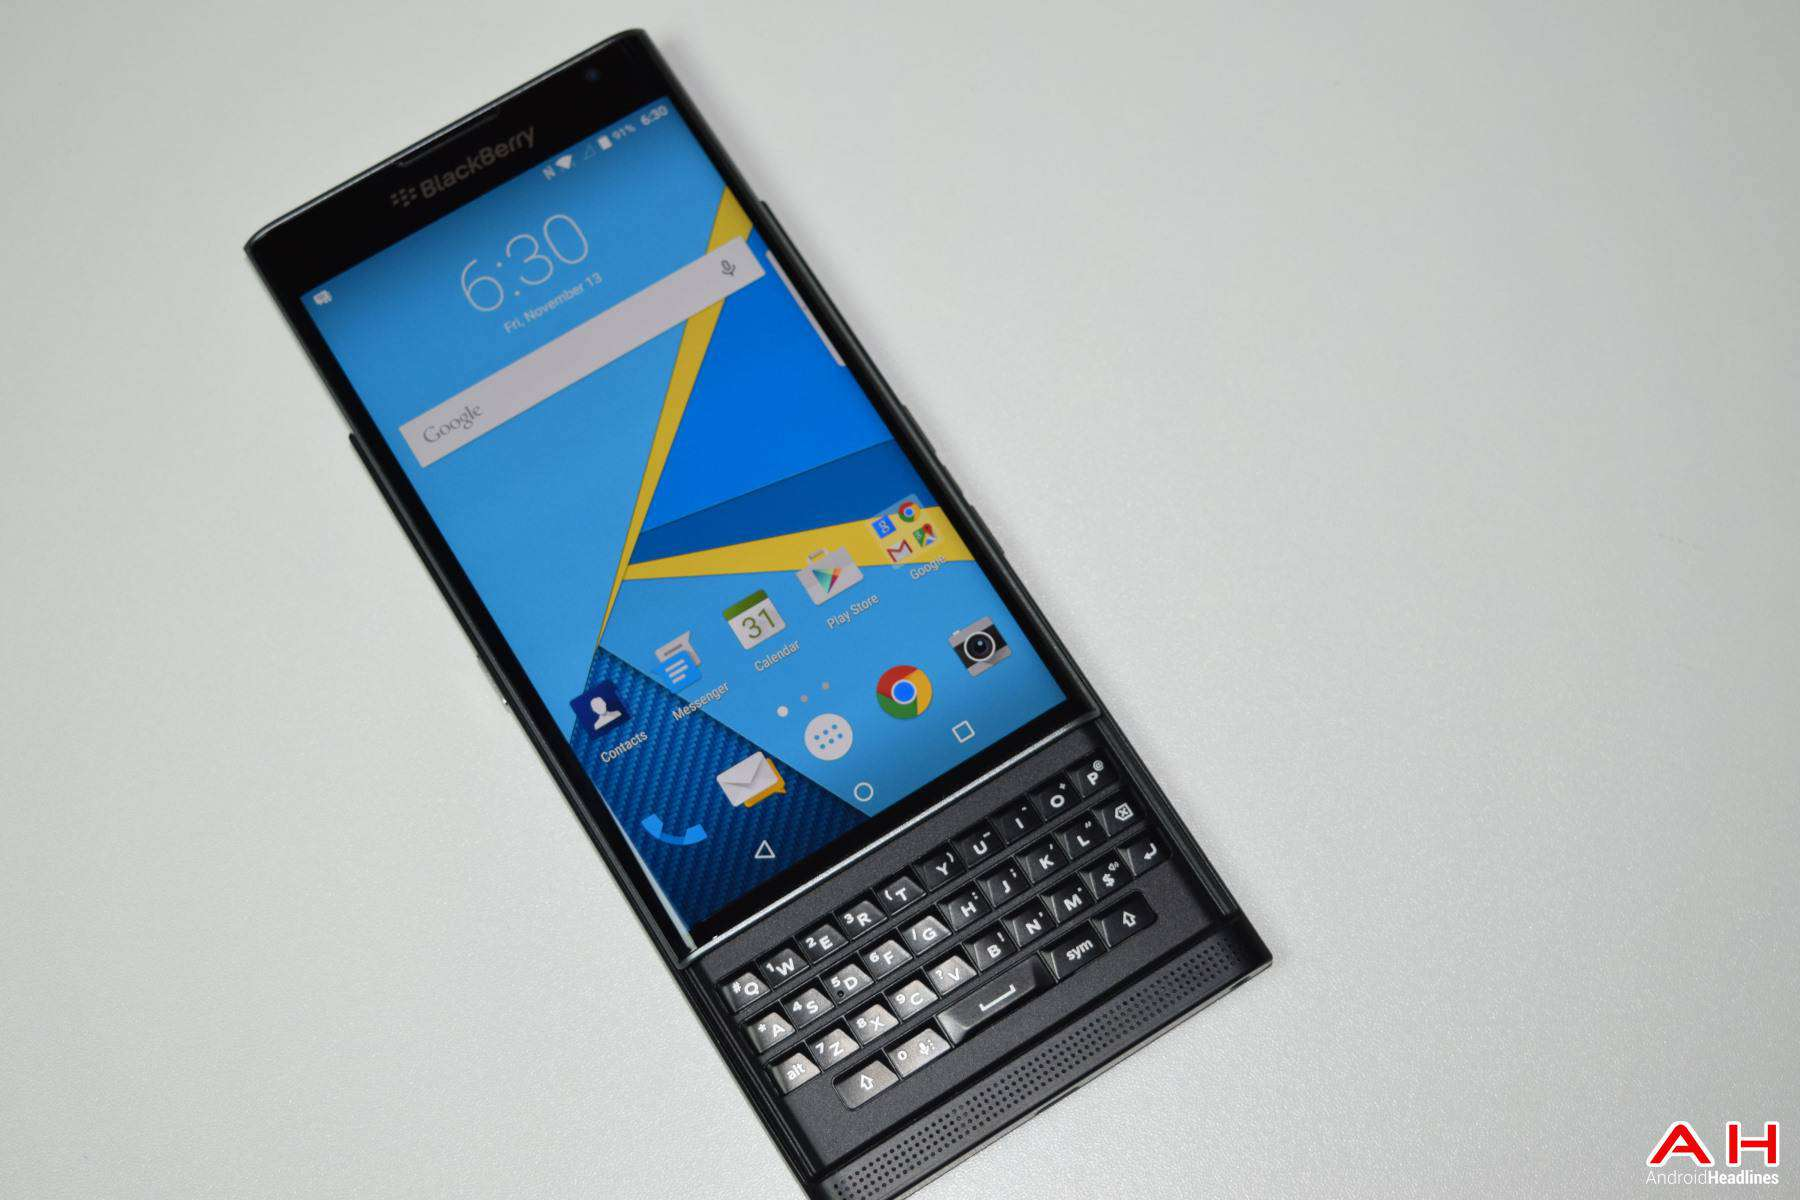 AH BB Blackberry Priv Qwerty Keyboard 2016 Chris -26